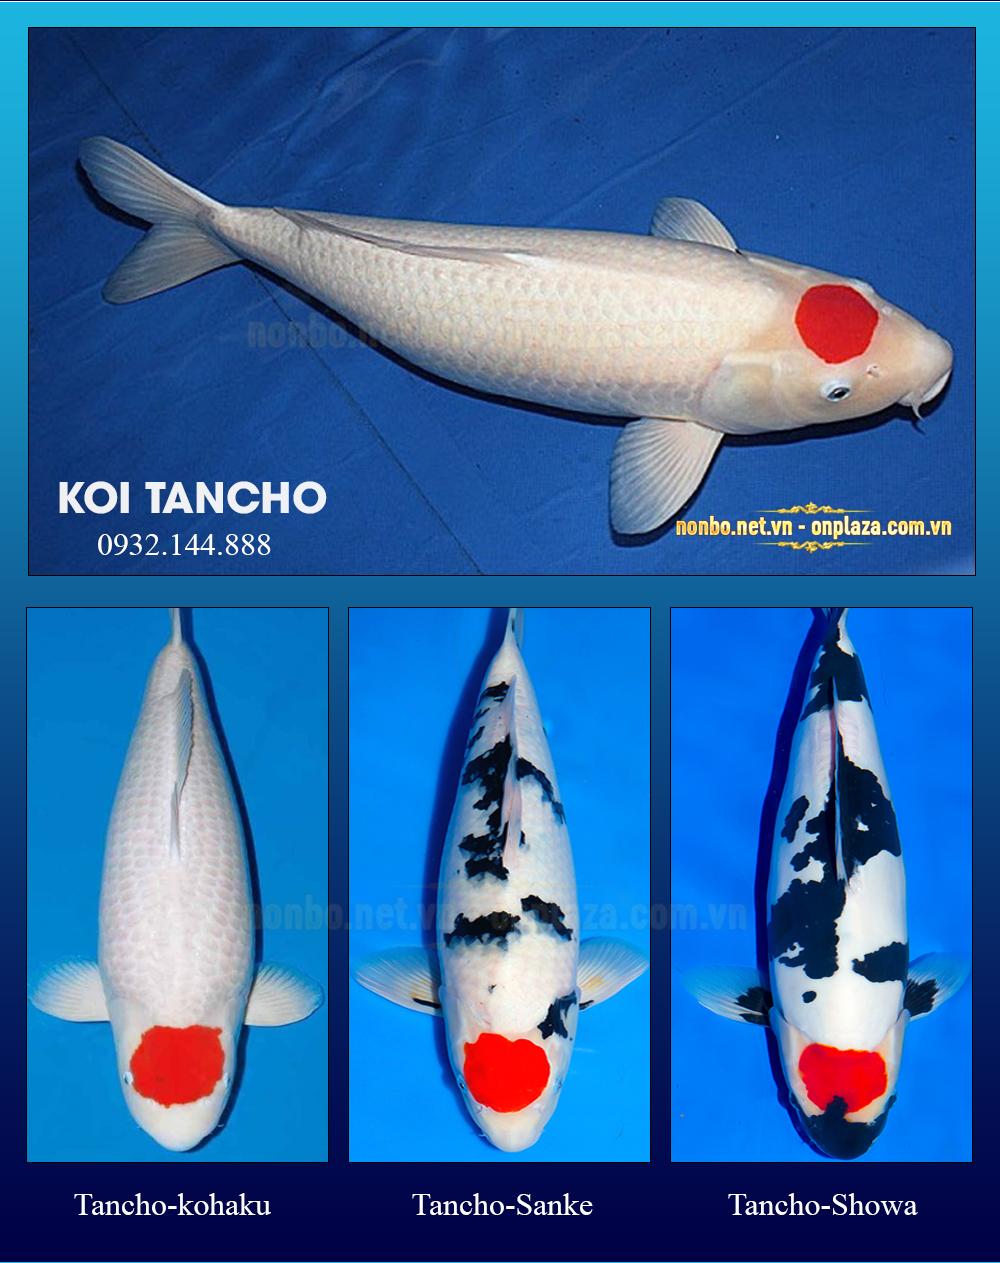 Cá koi Tancho